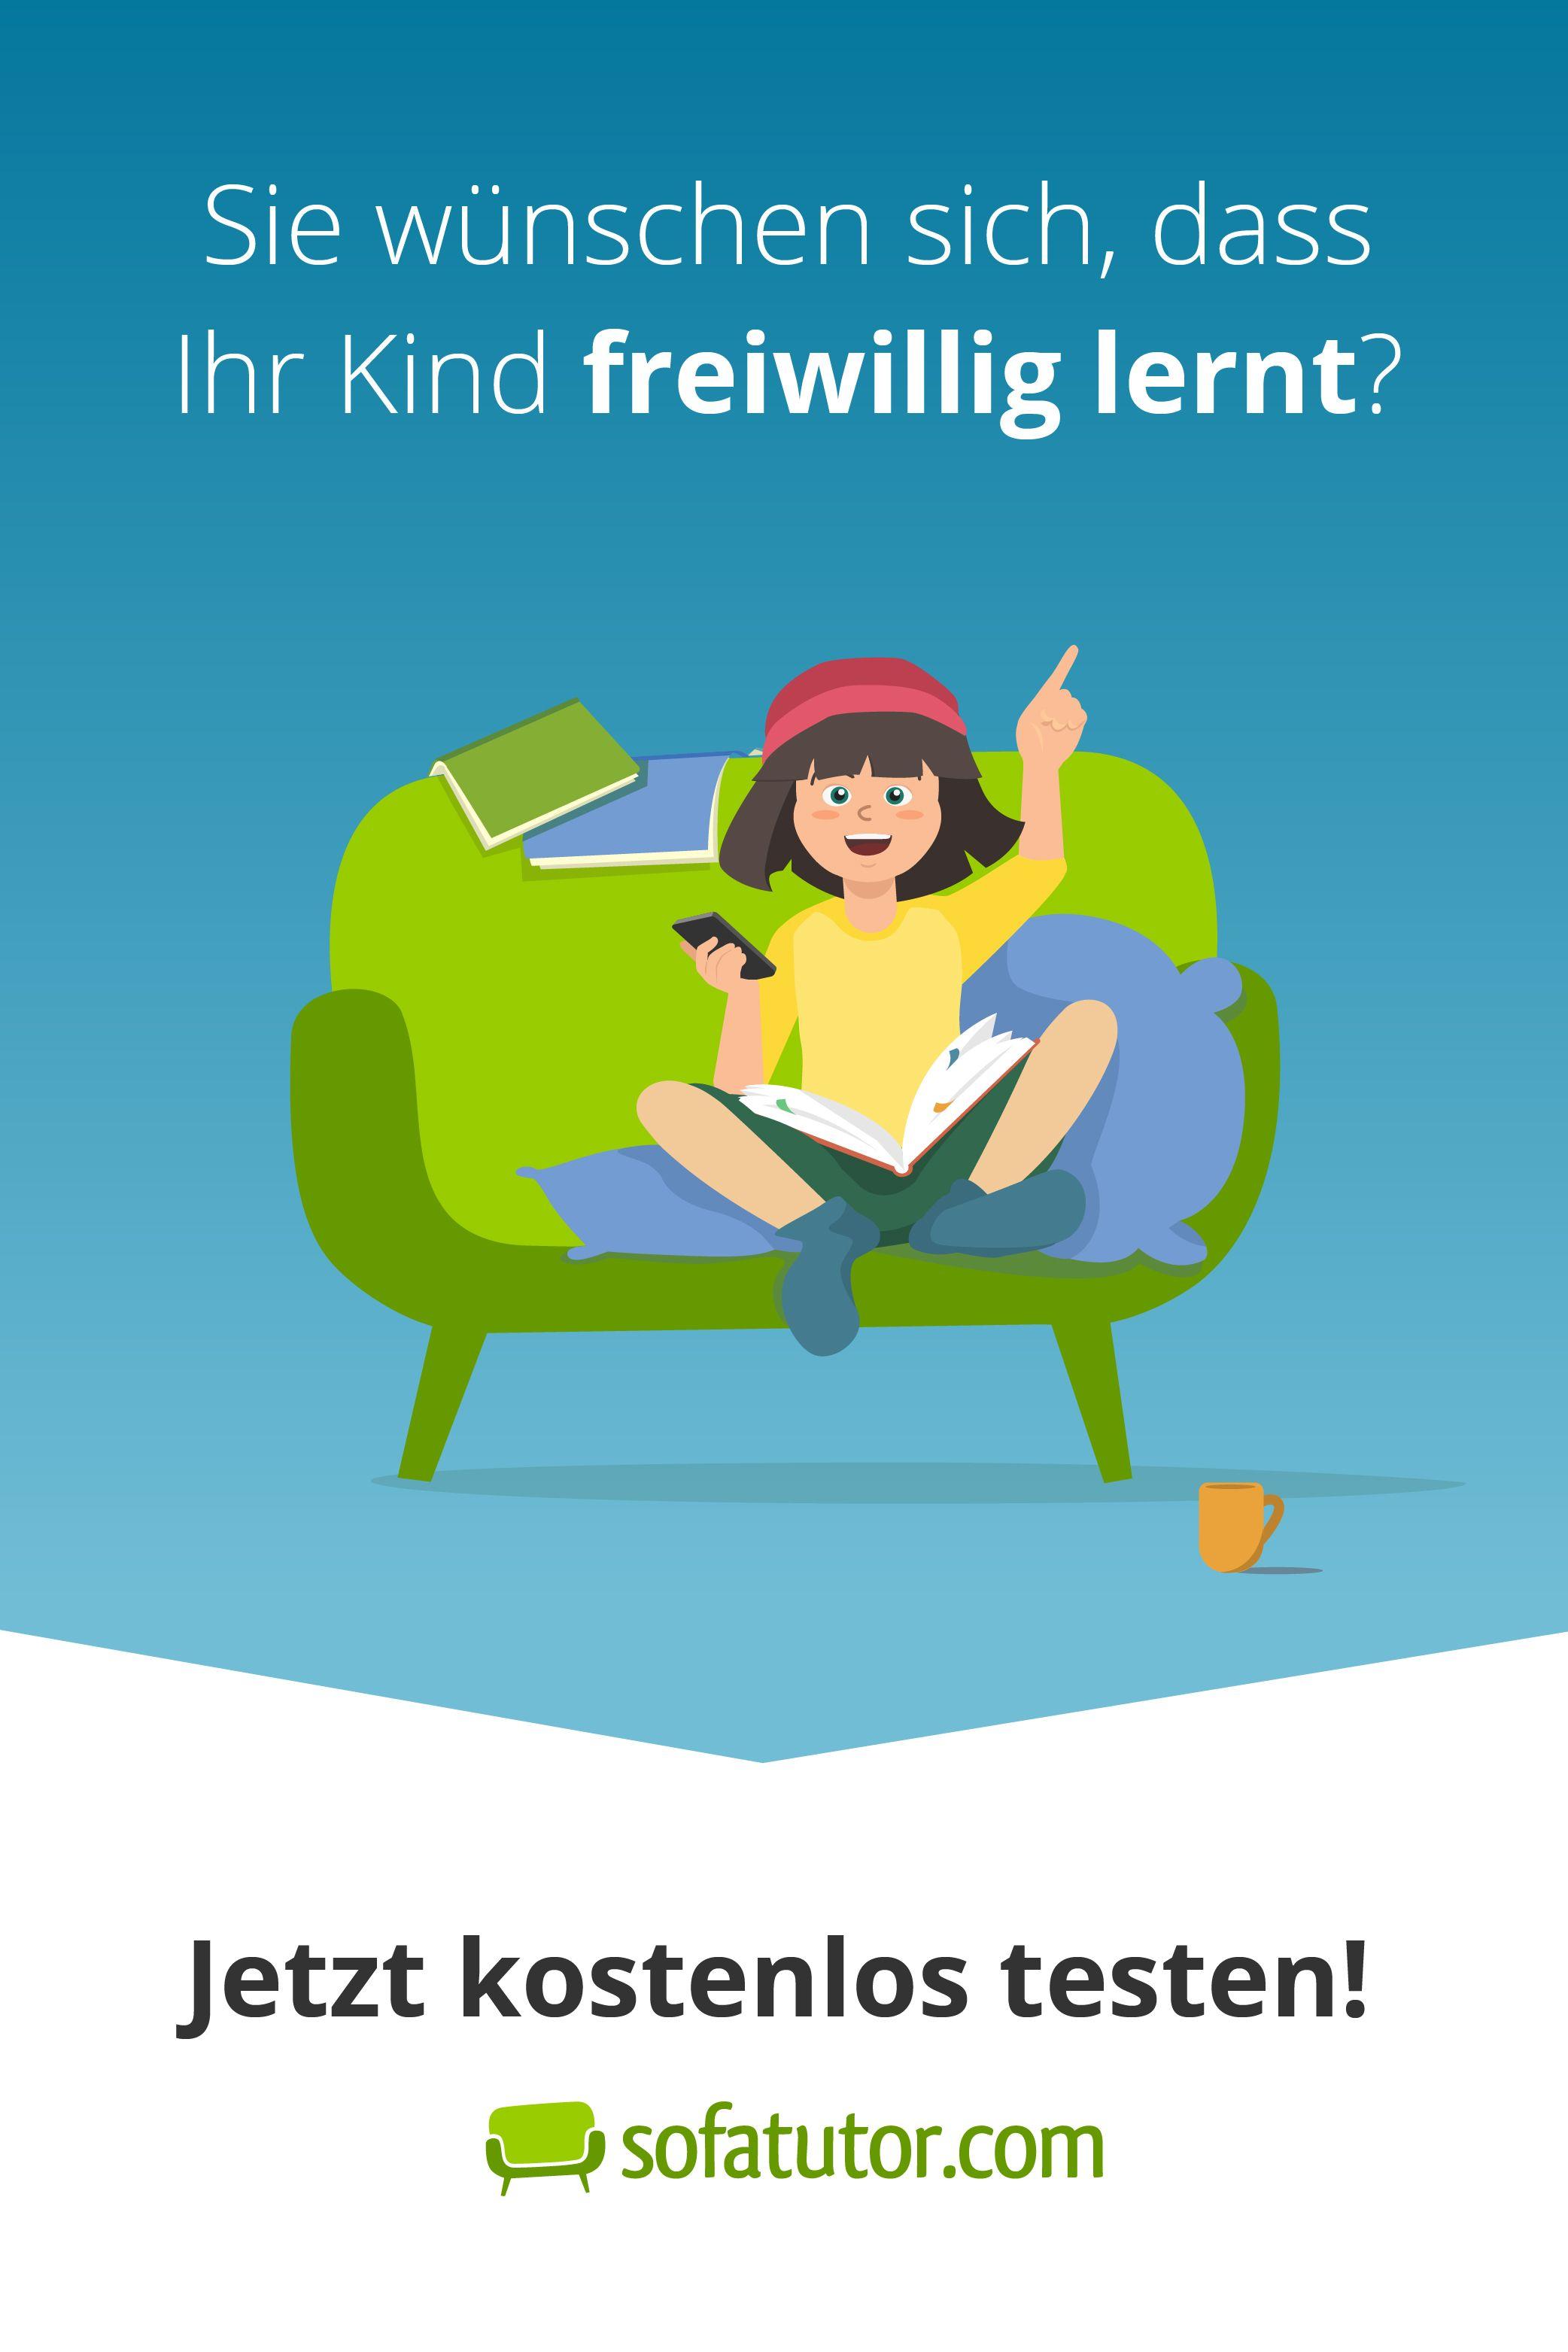 Sofatutor Com Mit Spass Lernen Noten Verbessern Spass Lernen Lernen Lernen Tipps Schule